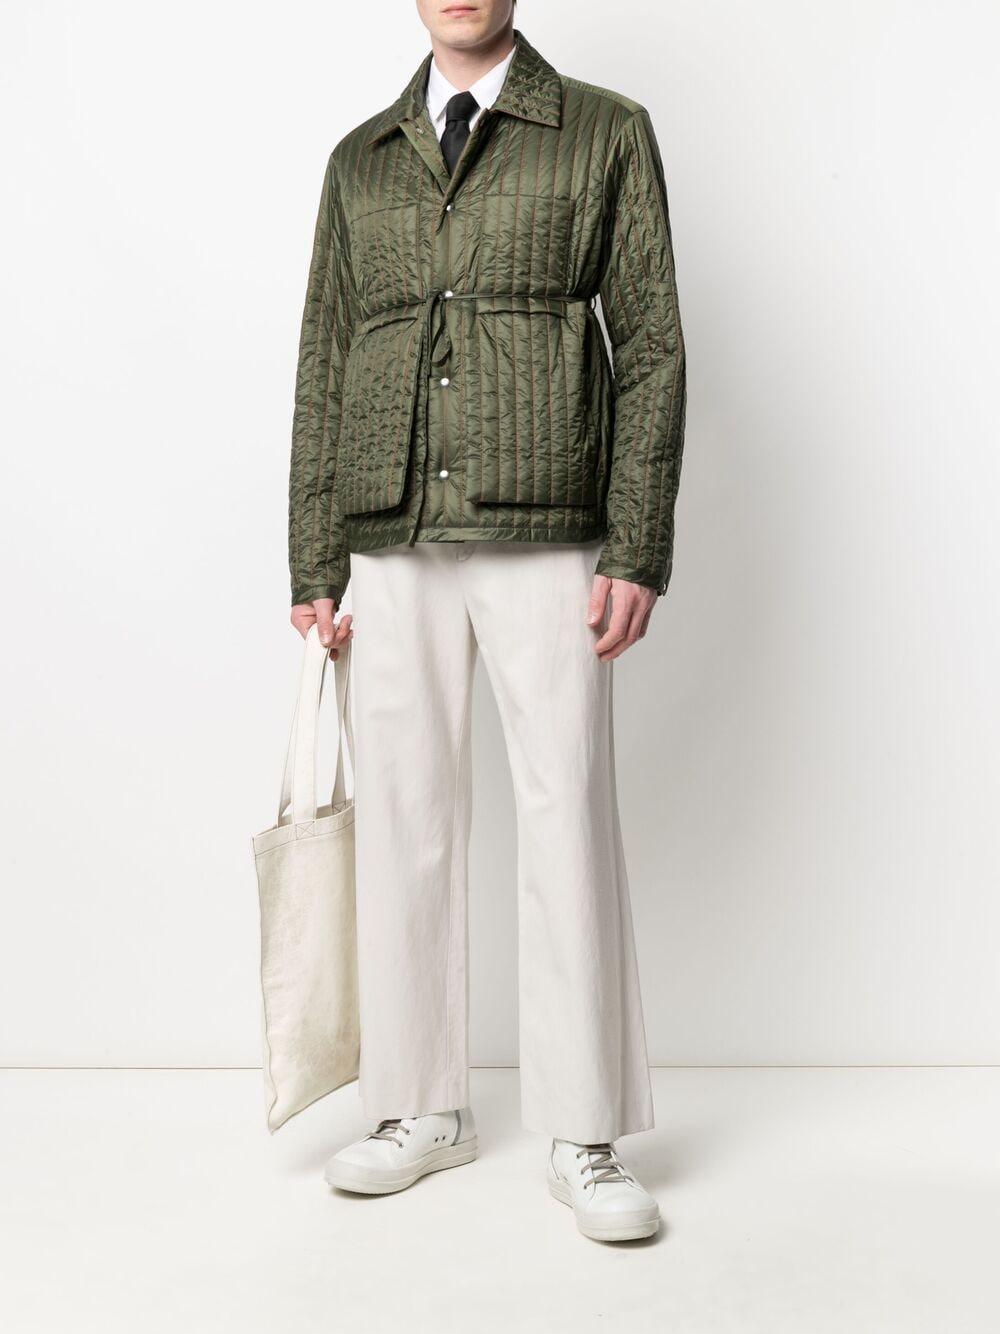 Craig green giacca imbttita con vita annodata uomo CRAIG GREEN | Giacche | CGSS21CWOJKT01GREEN